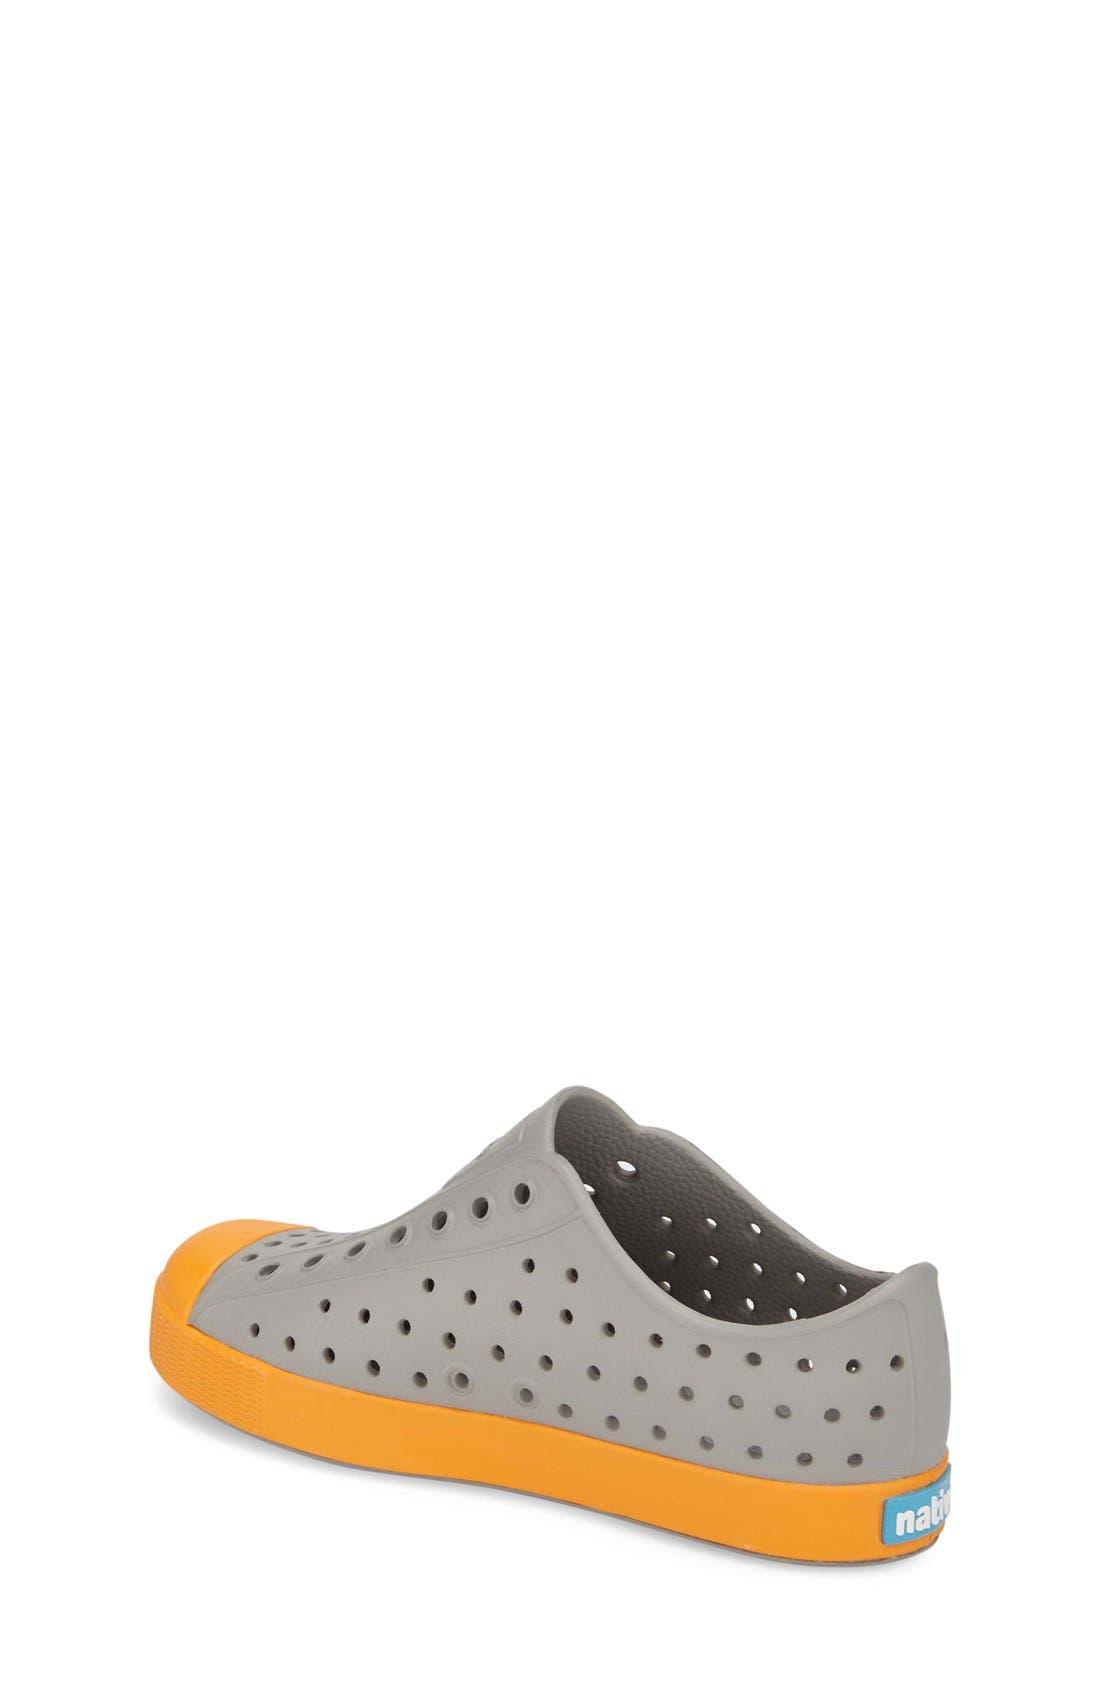 'Jefferson' Water Friendly Slip-On Sneaker,                             Alternate thumbnail 85, color,